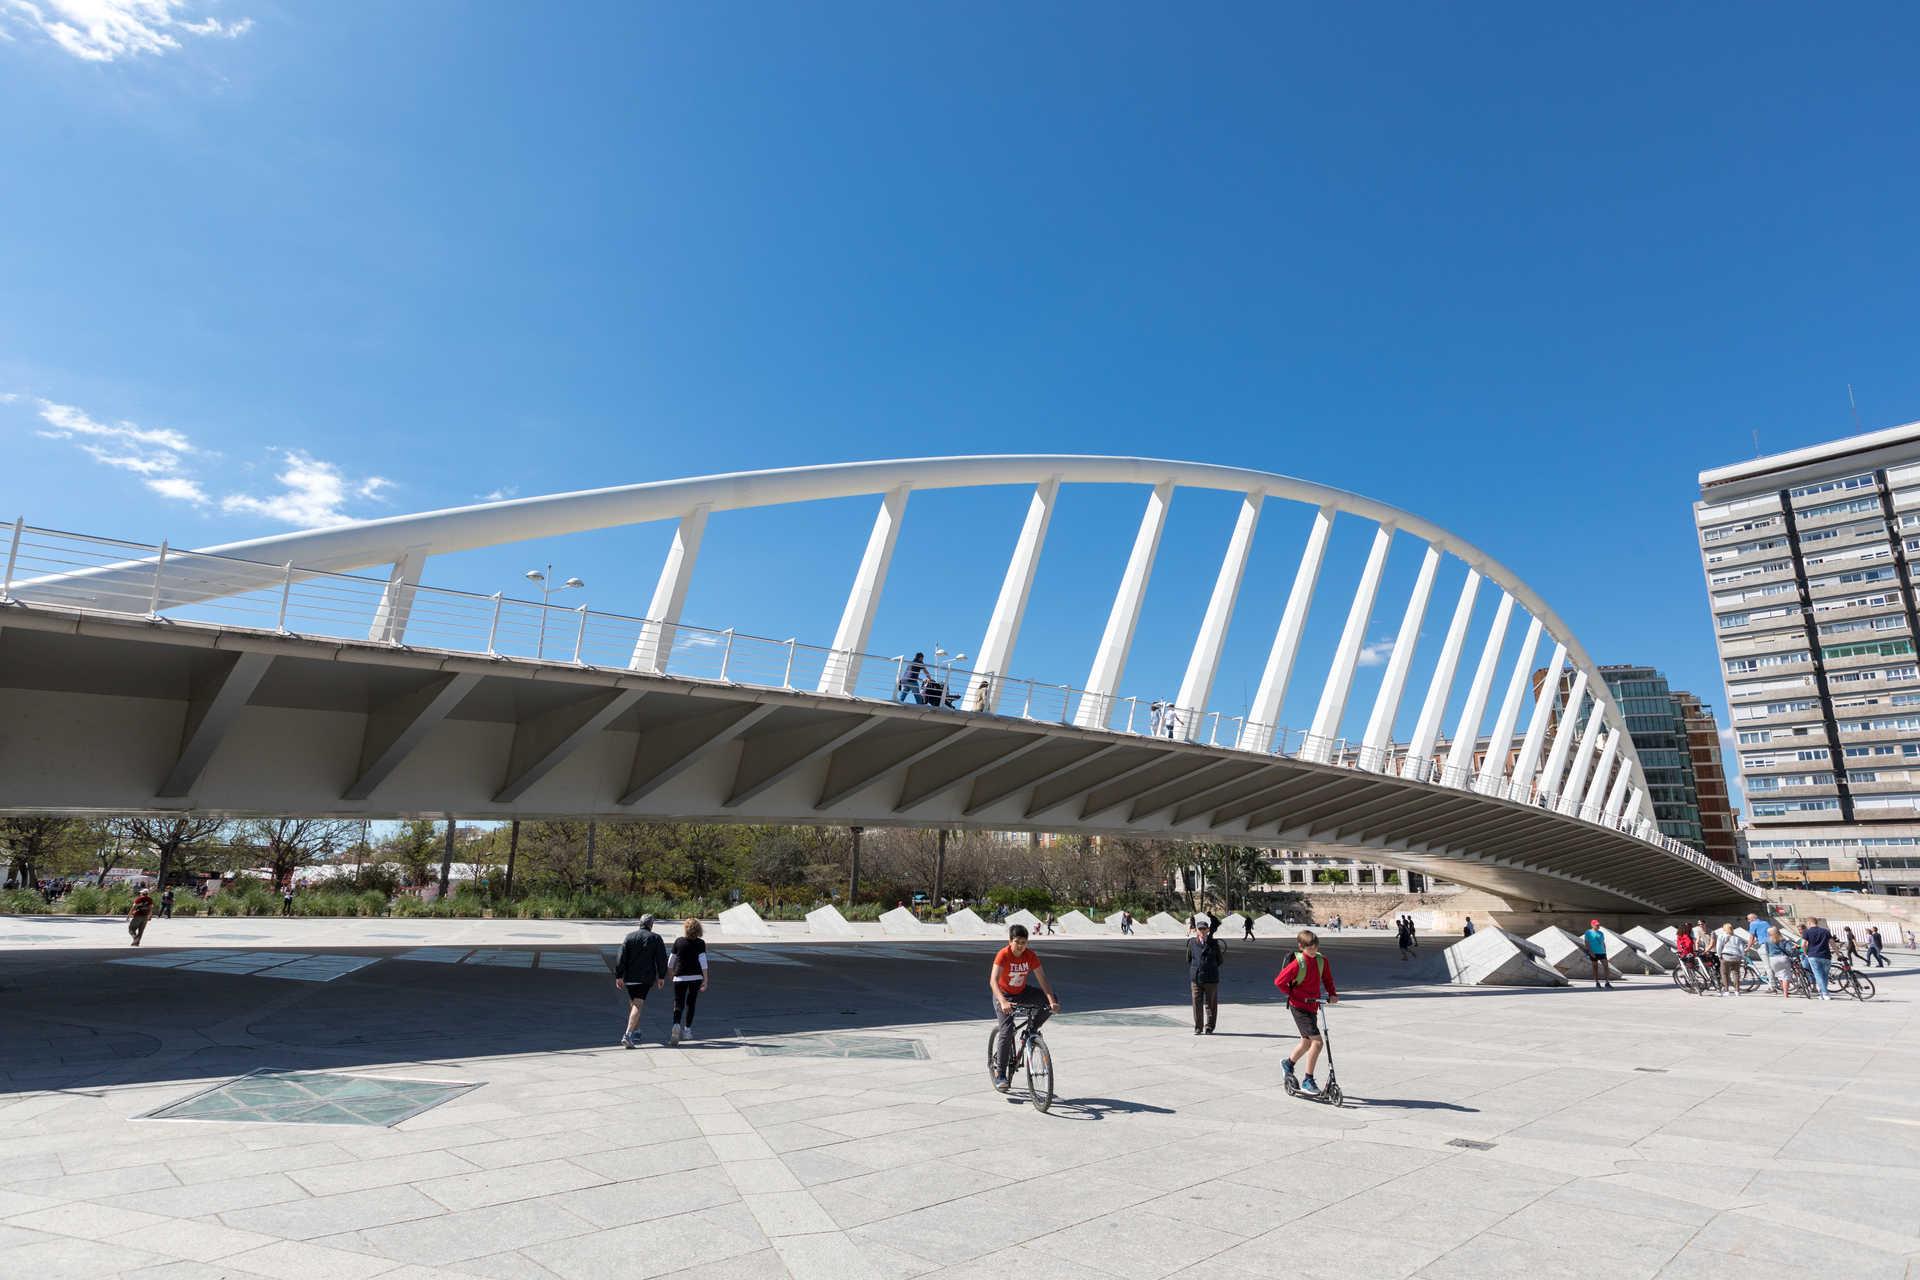 The bridges of the river Turia